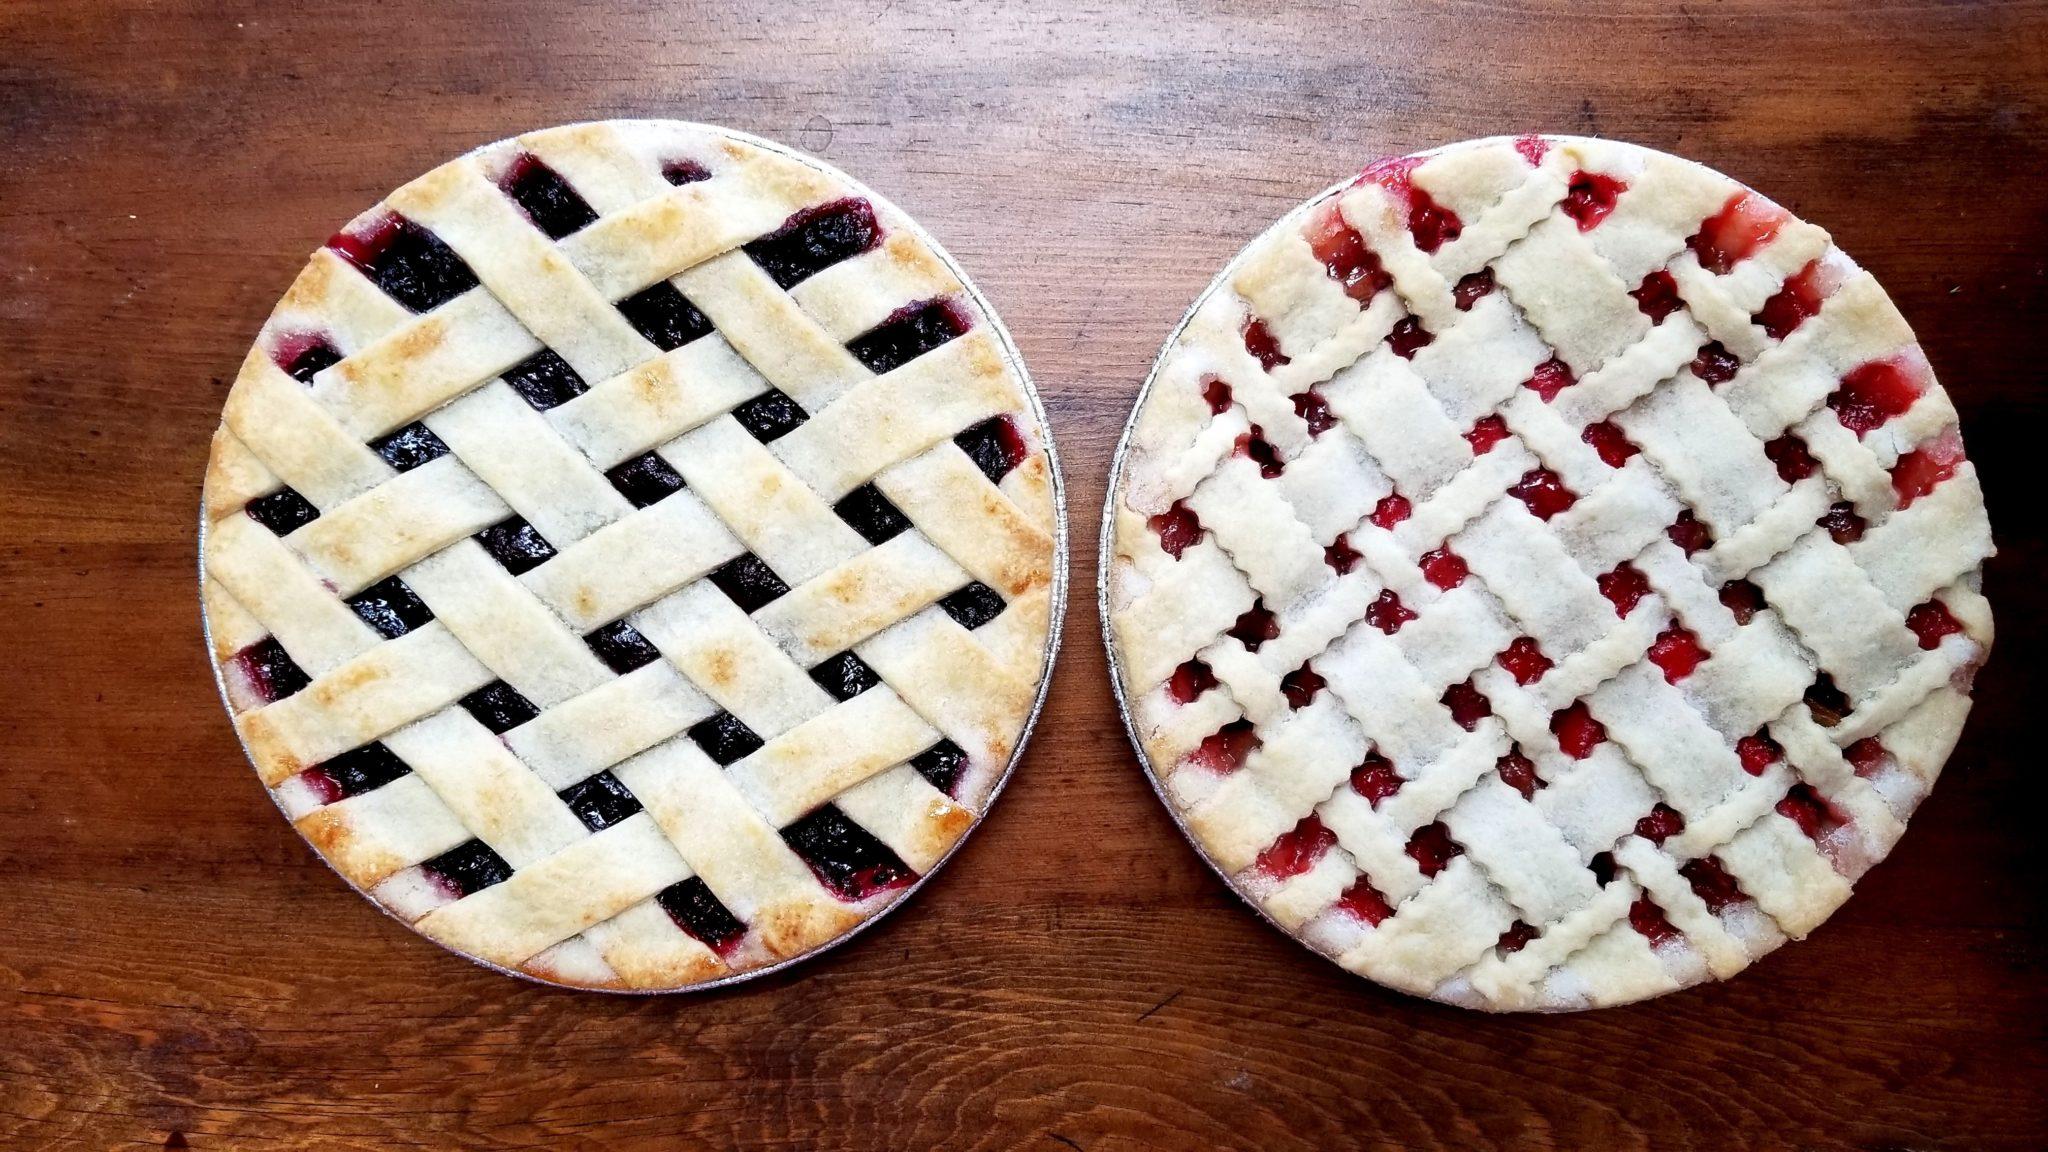 bentonville-gooseberry-handmade-pies-blueberry-and-strawberry-lattice-pies-by-kat-robinson.jpg